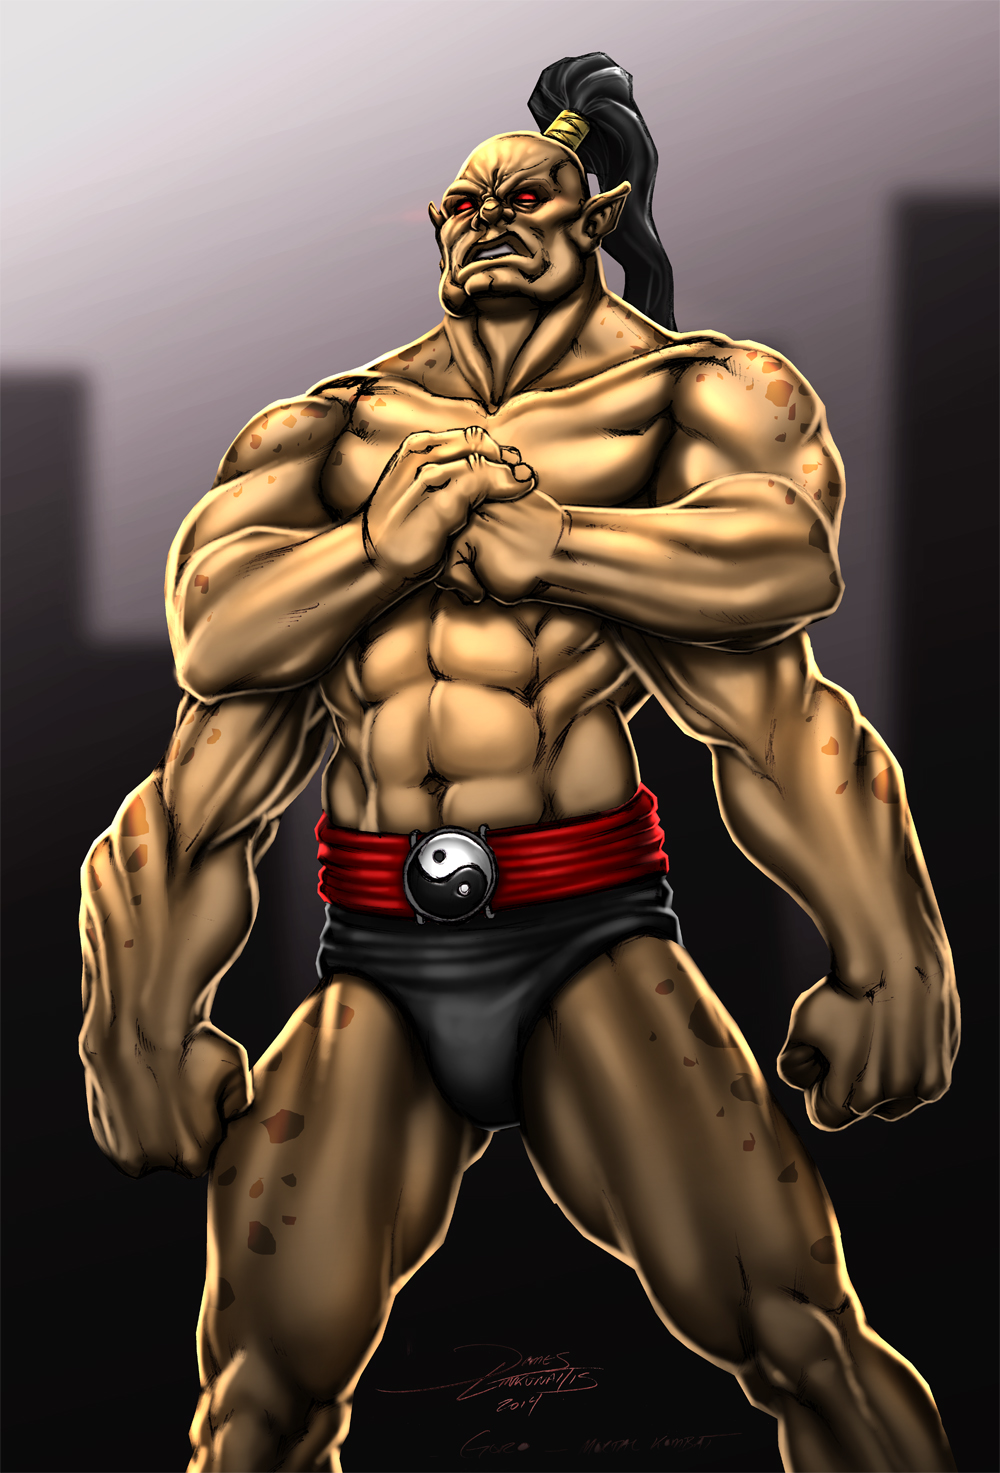 Goro (Mortal Kombat) by jameslink